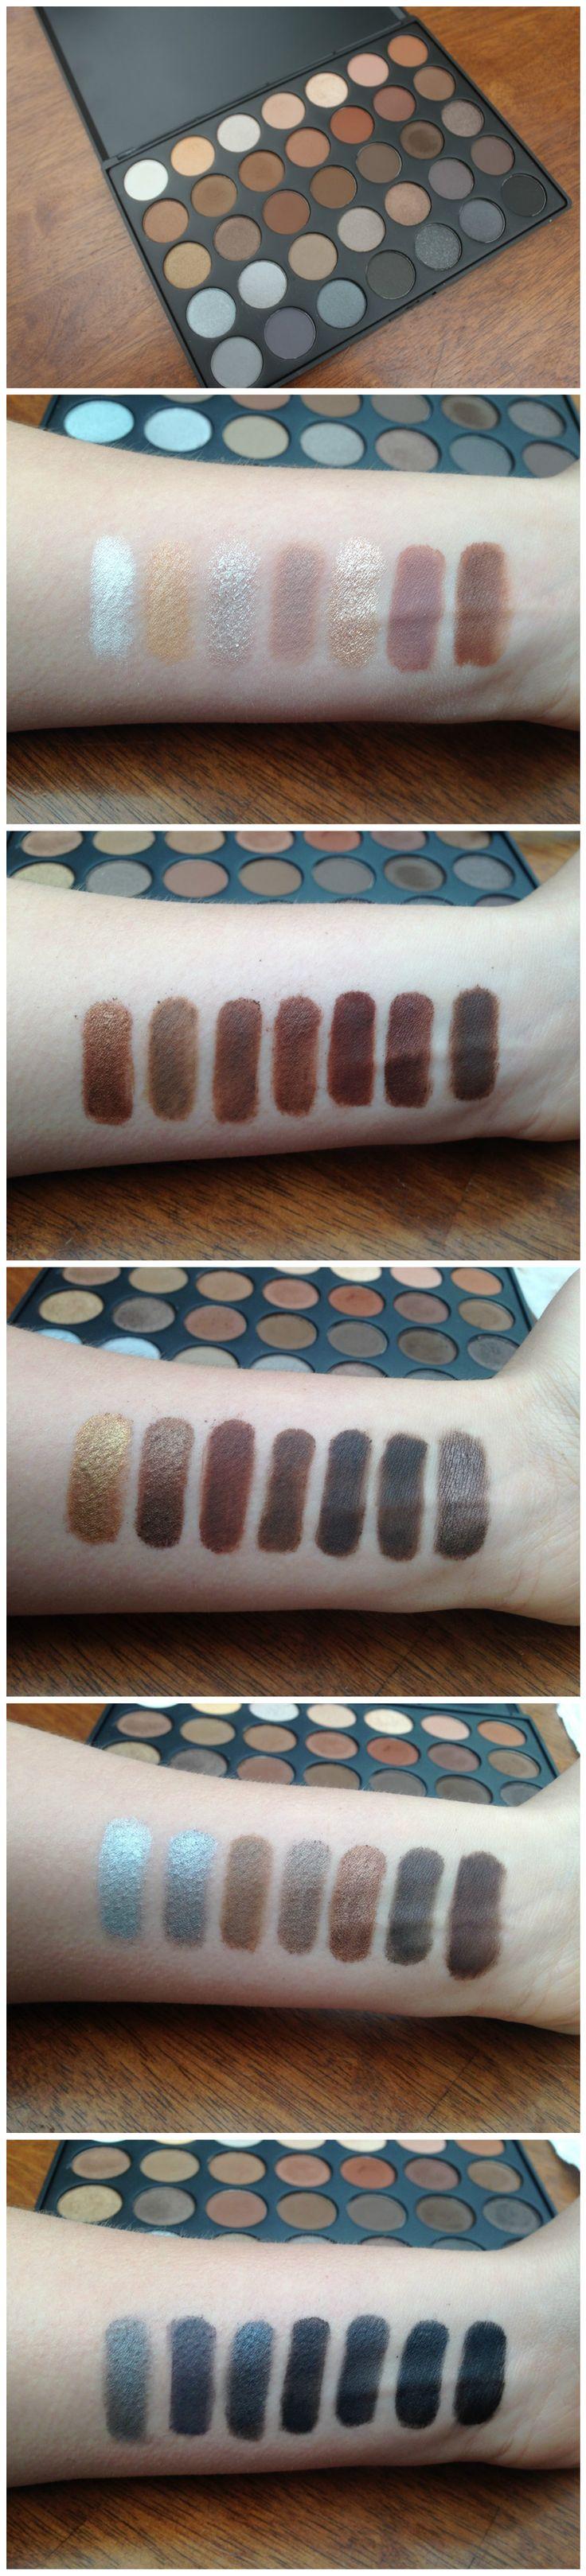 Morphe 35k eyeshadow palette review beauty in bold - 35k Koffee Palette Review